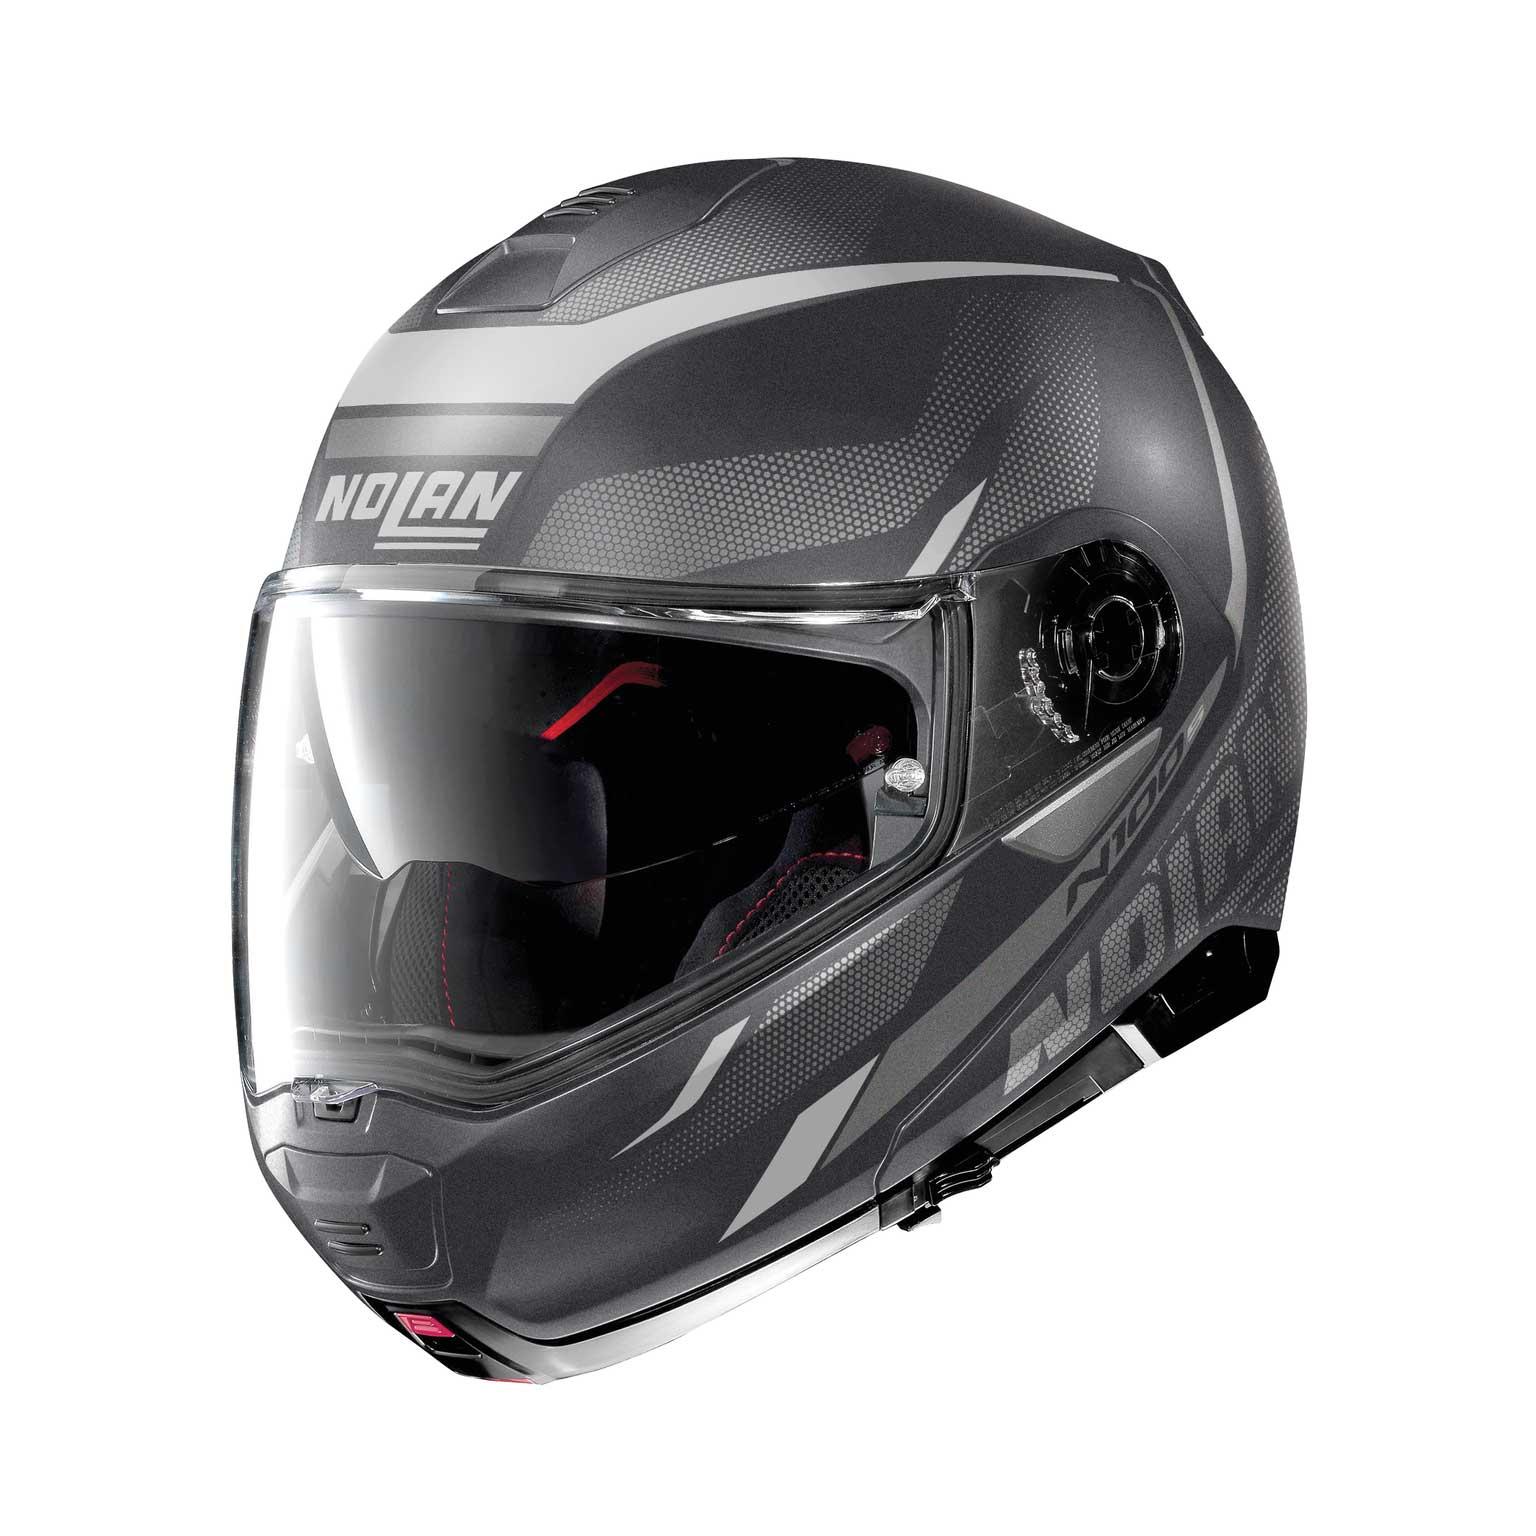 Nolan N100.5 Lumière N-Com modularer Helm grau